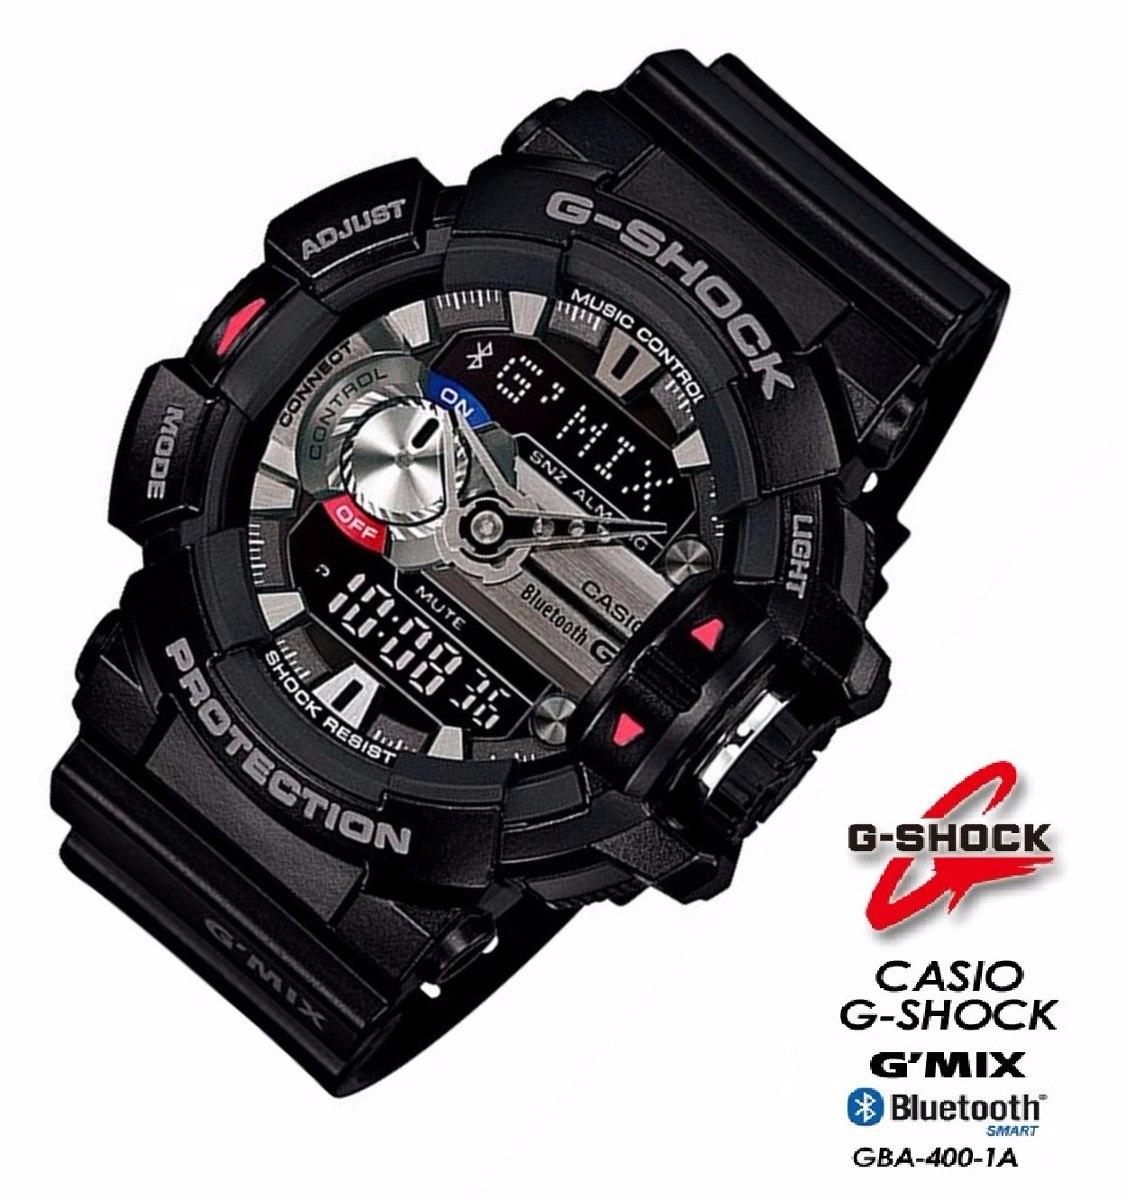 f44c500494a Relogio Casio G-shock Gba-400 1adr Bluetooth G Mix Wr-200m P - R ...